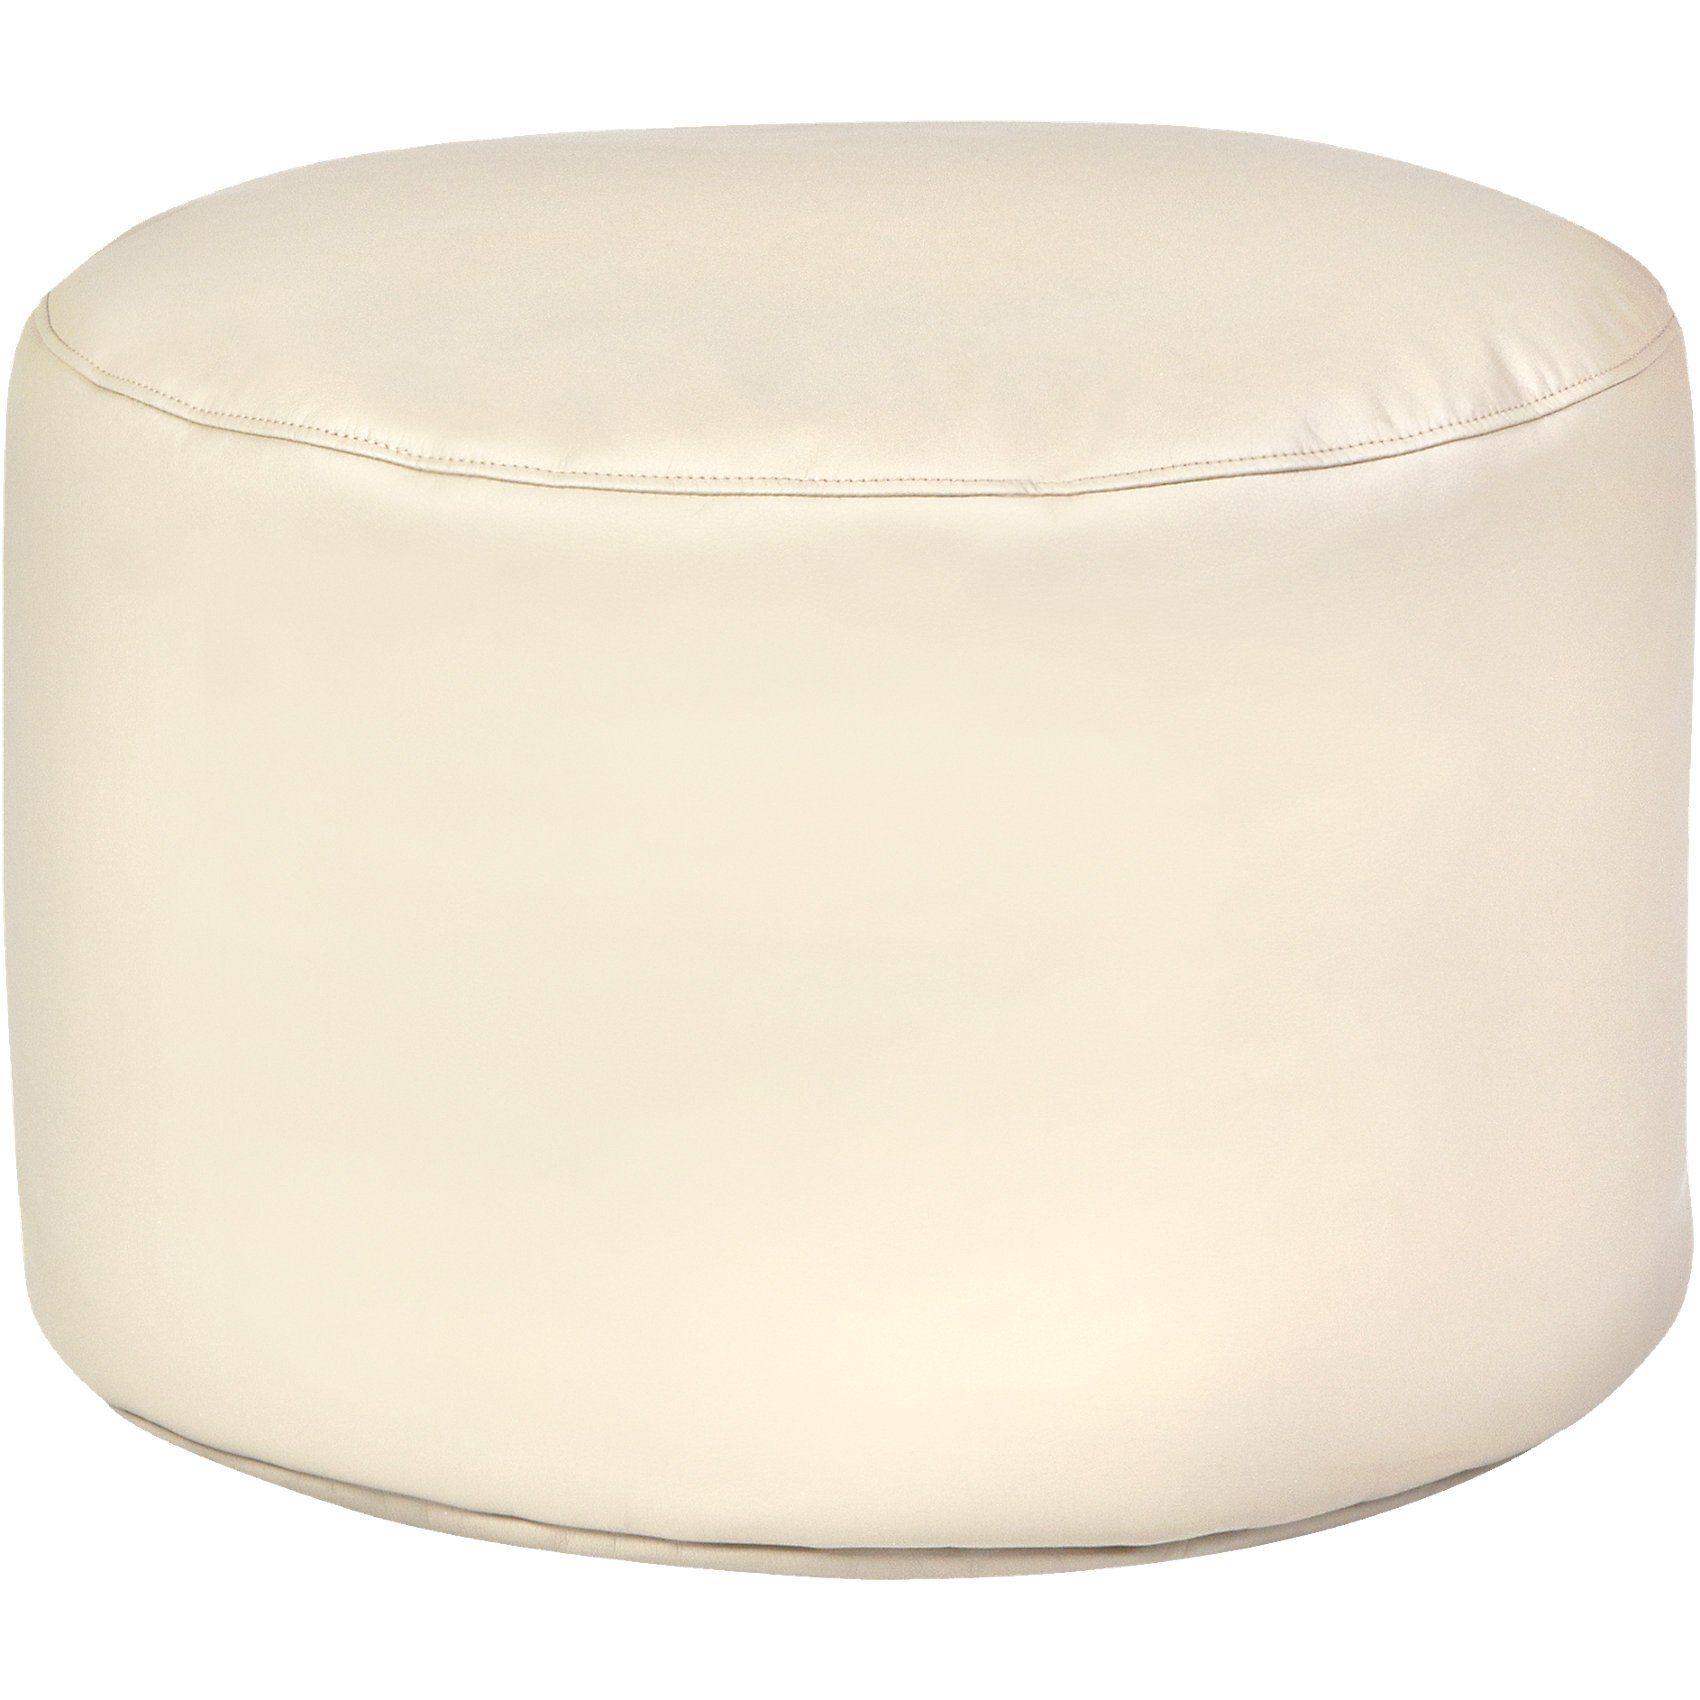 Sitzsack Drum, Kunstleder, beige